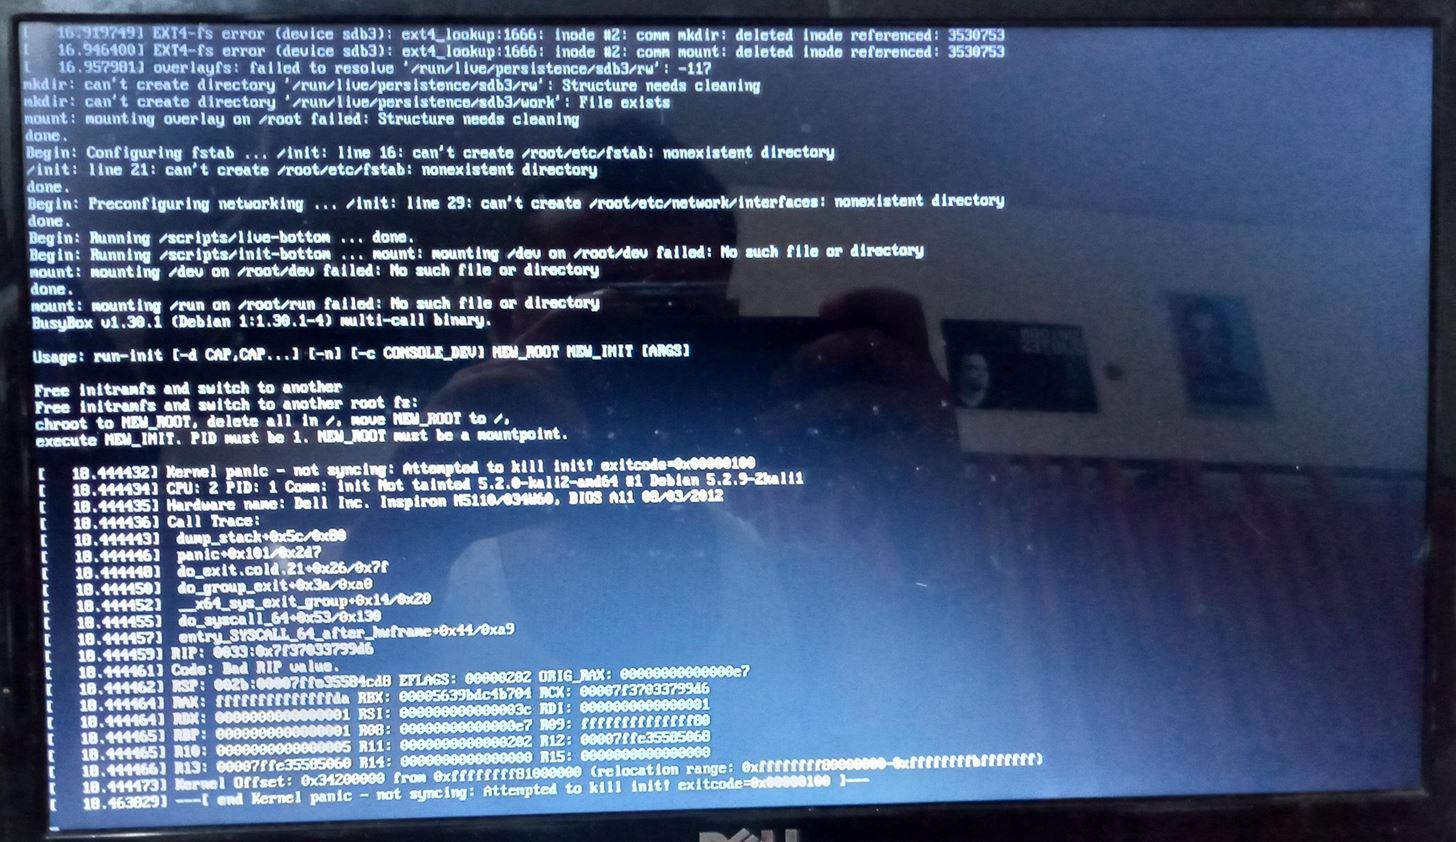 Kali Linux Persistence Error: No Solution on Internet